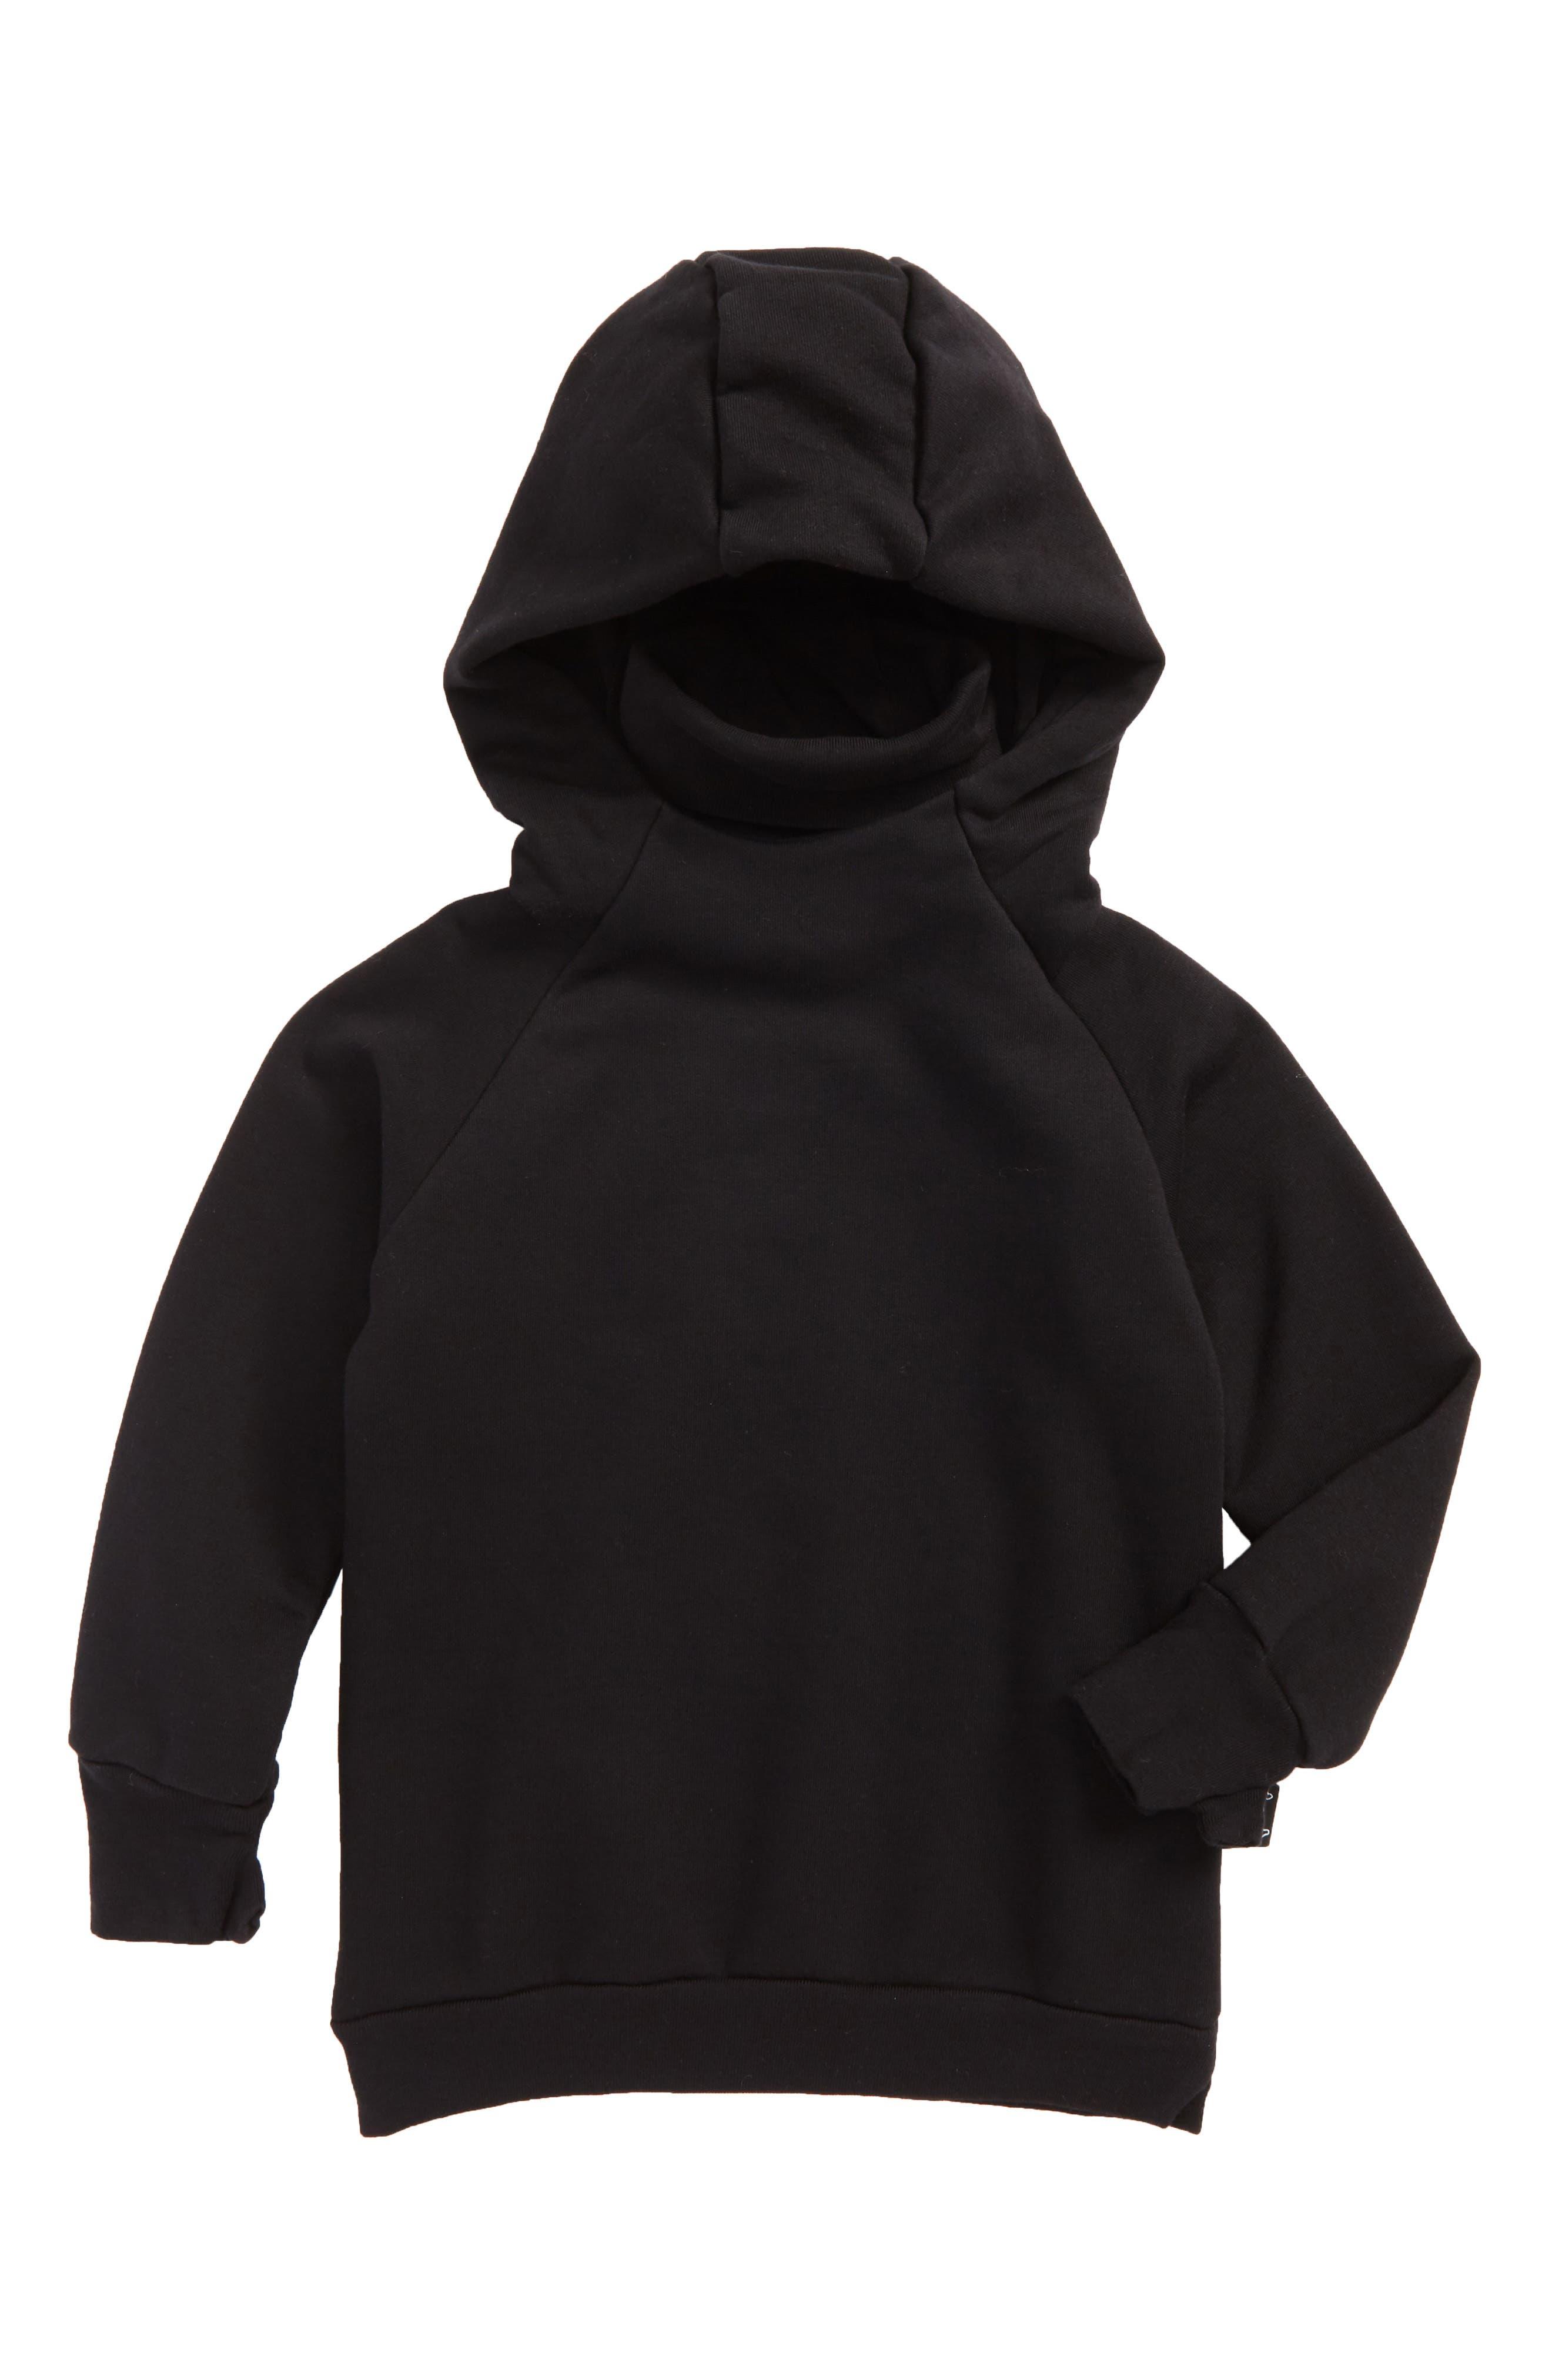 Ninja Hoodie,                             Main thumbnail 1, color,                             001